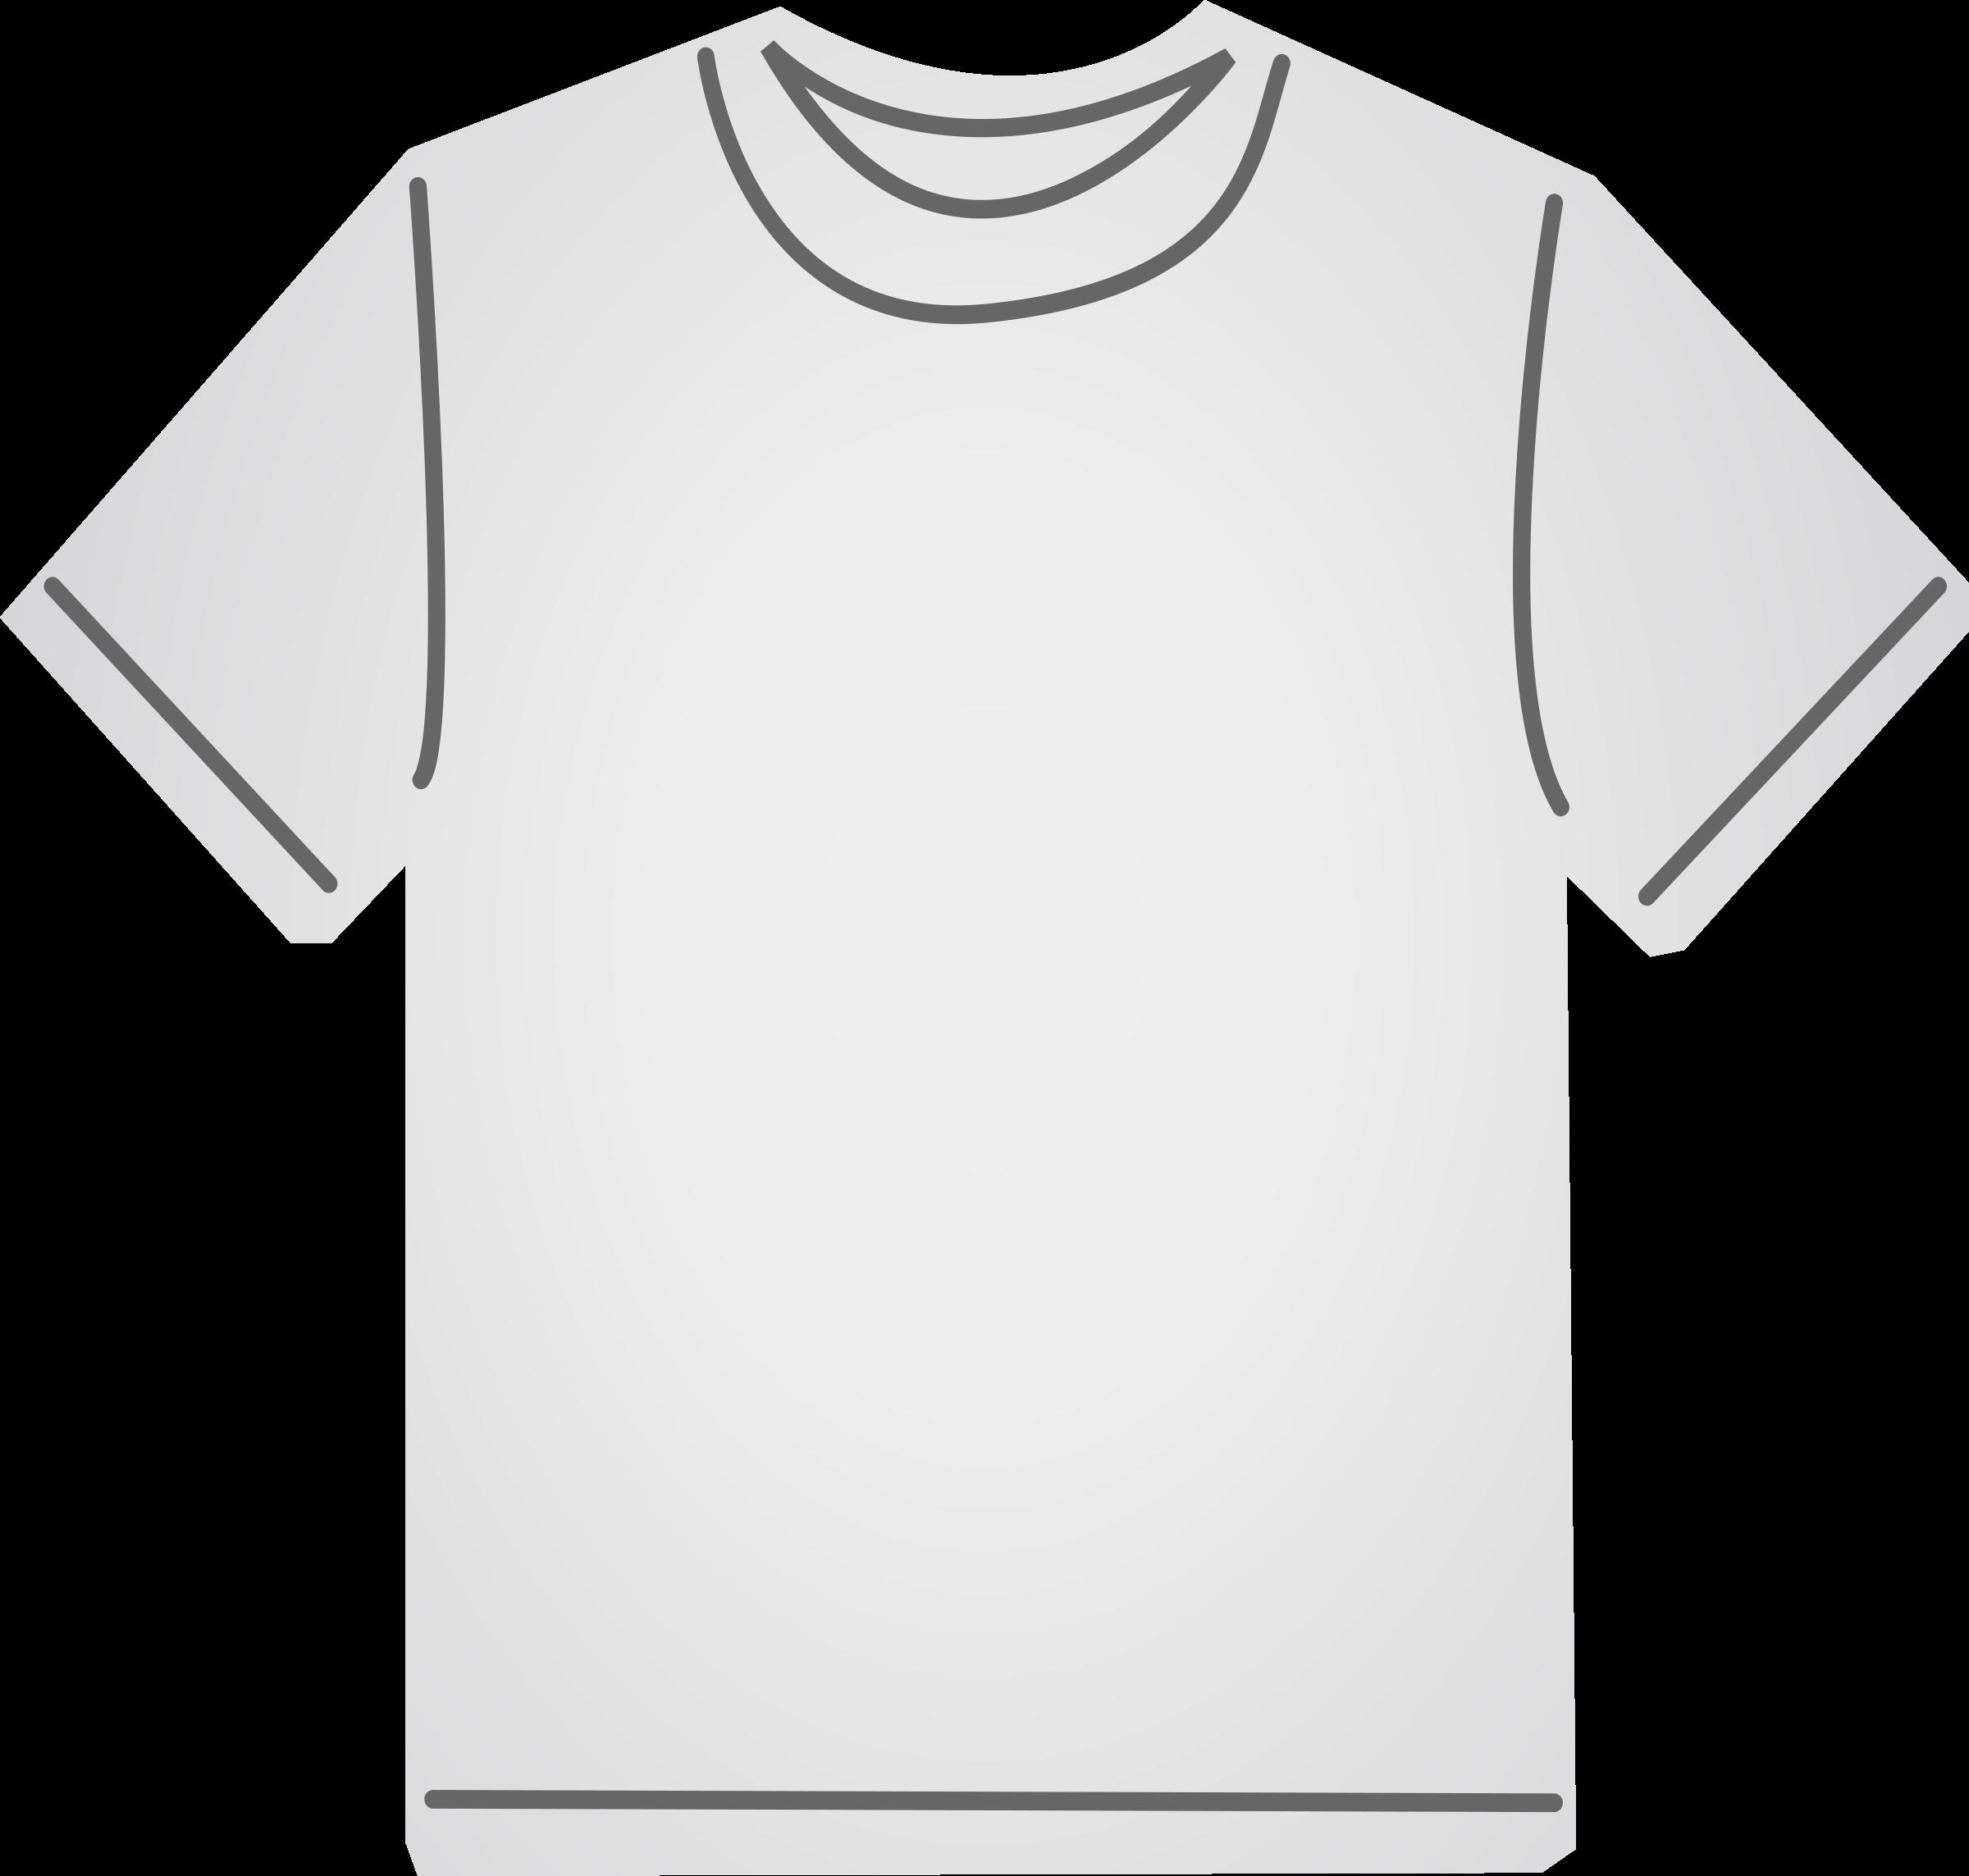 T shirt white png - Big Image Png